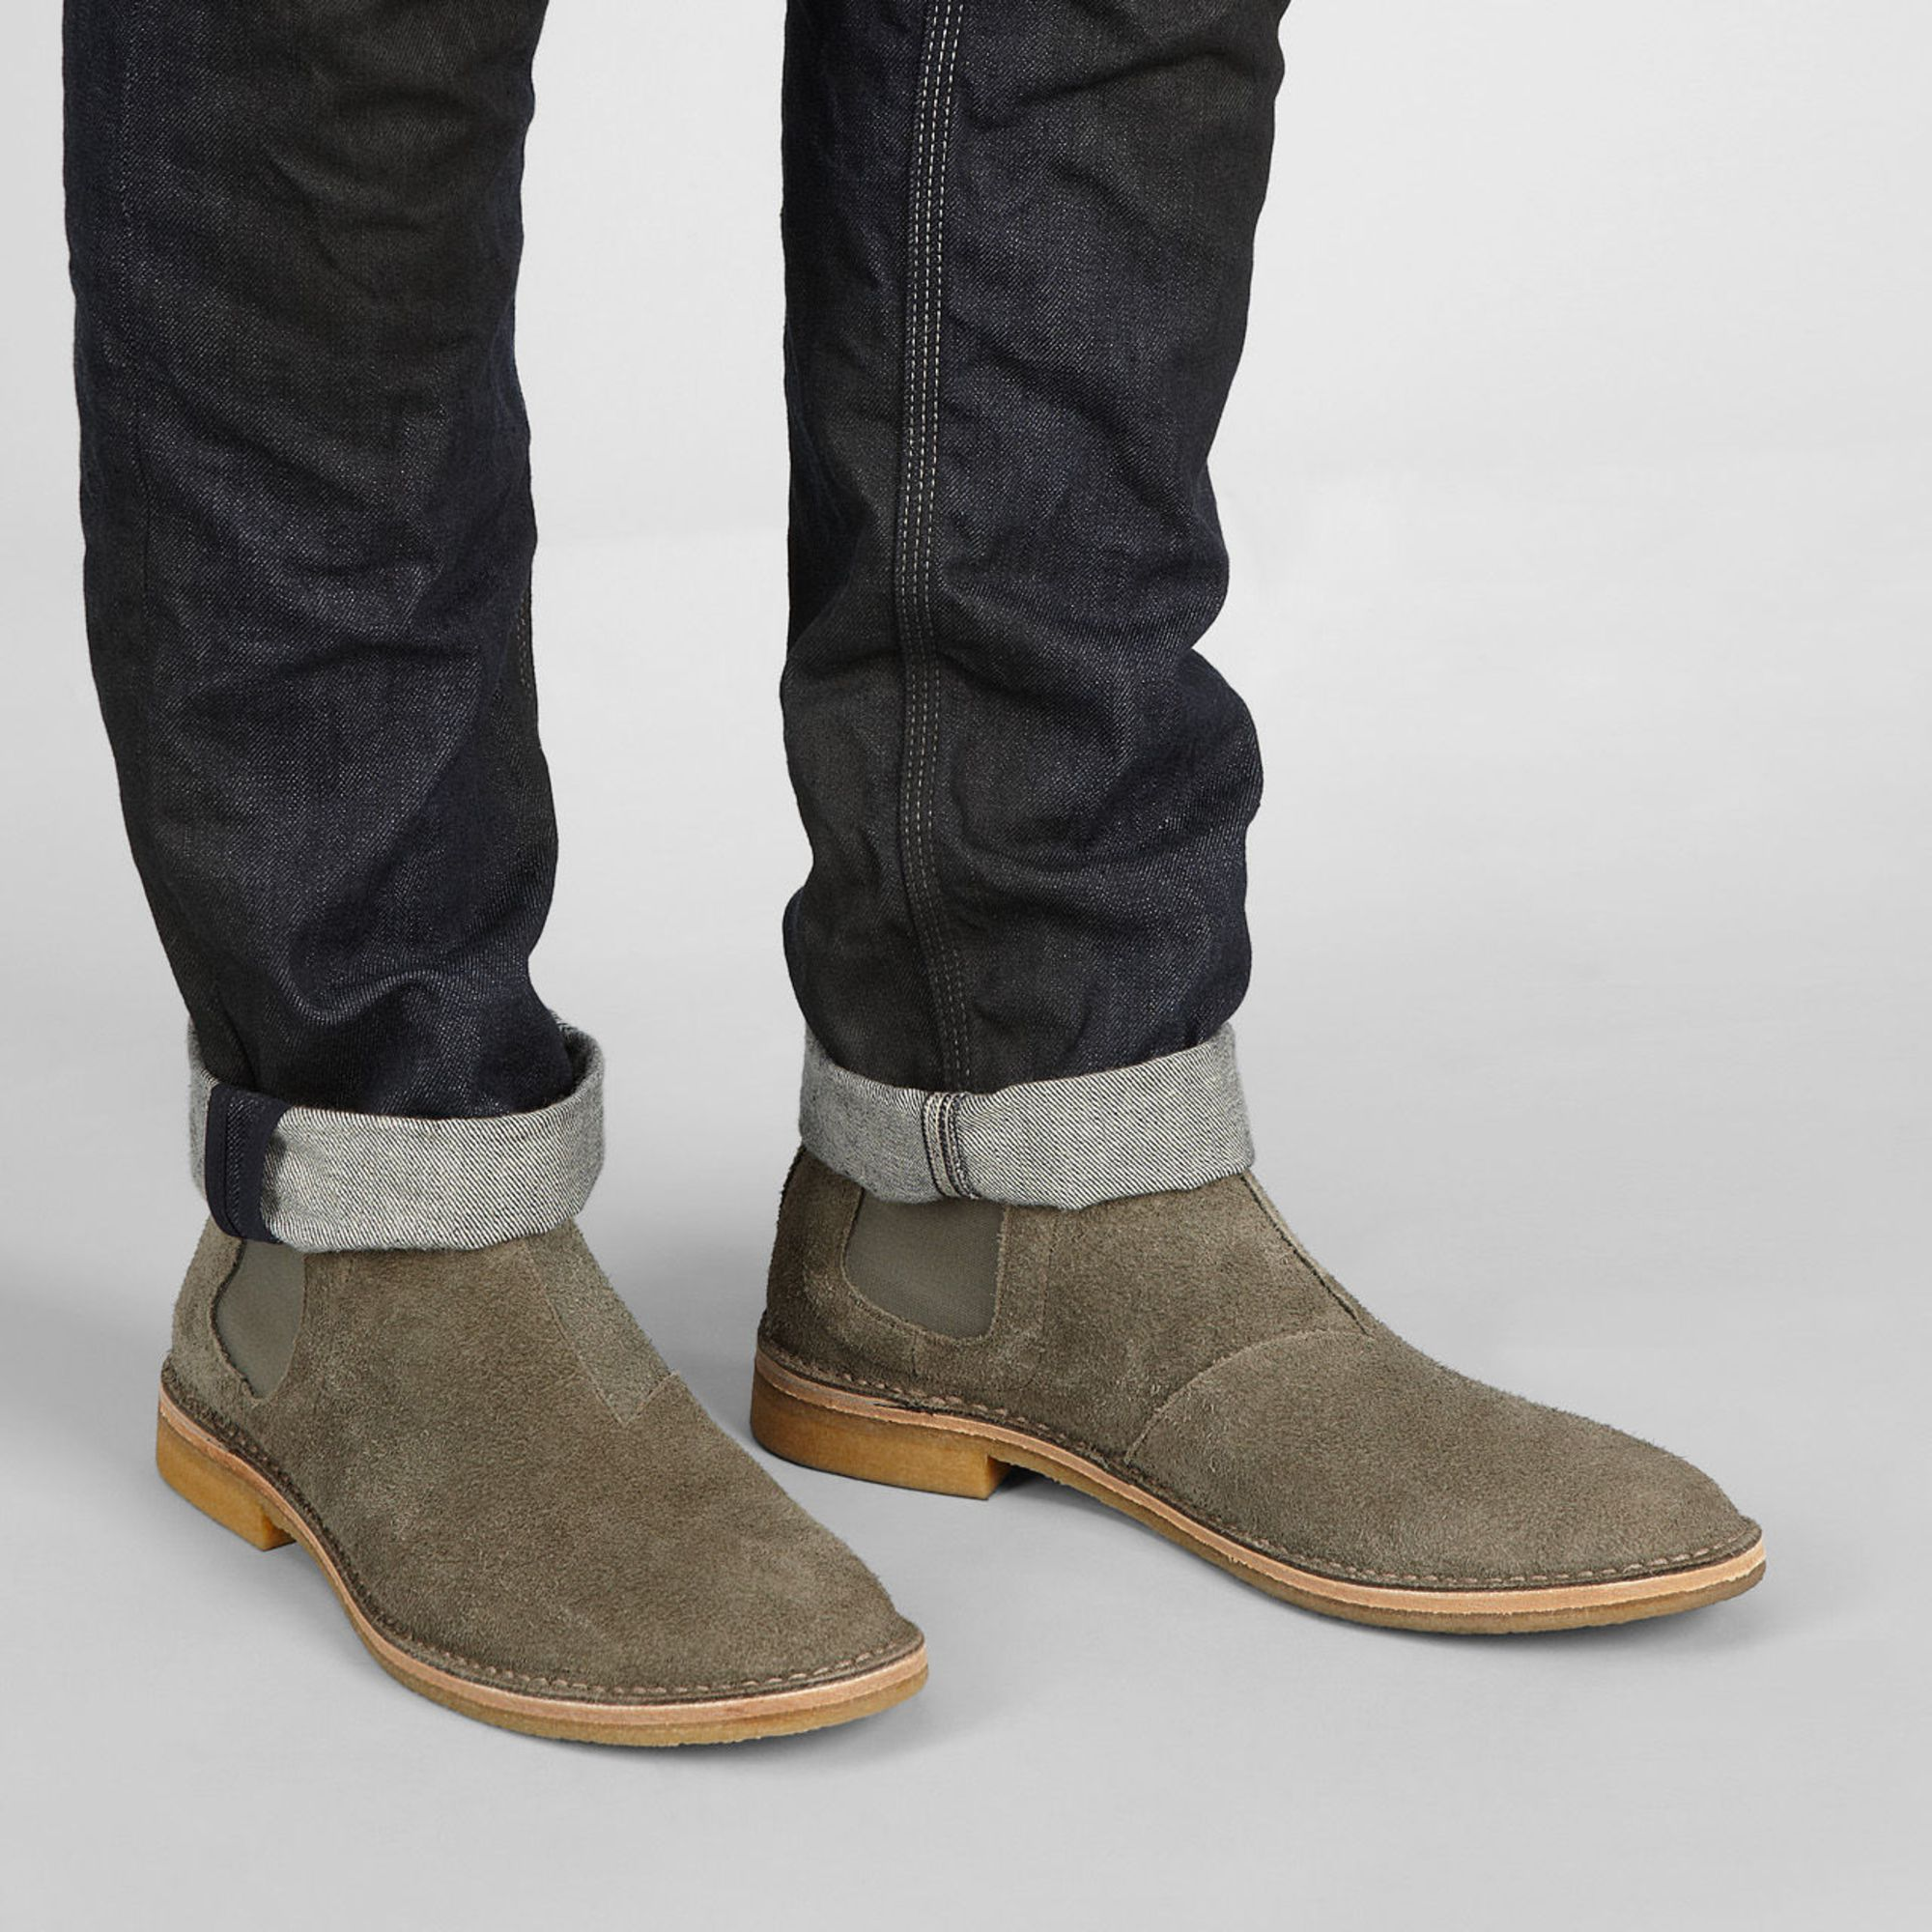 Bottega Veneta Aussie Suede Chelsea Boots RVwPDQc